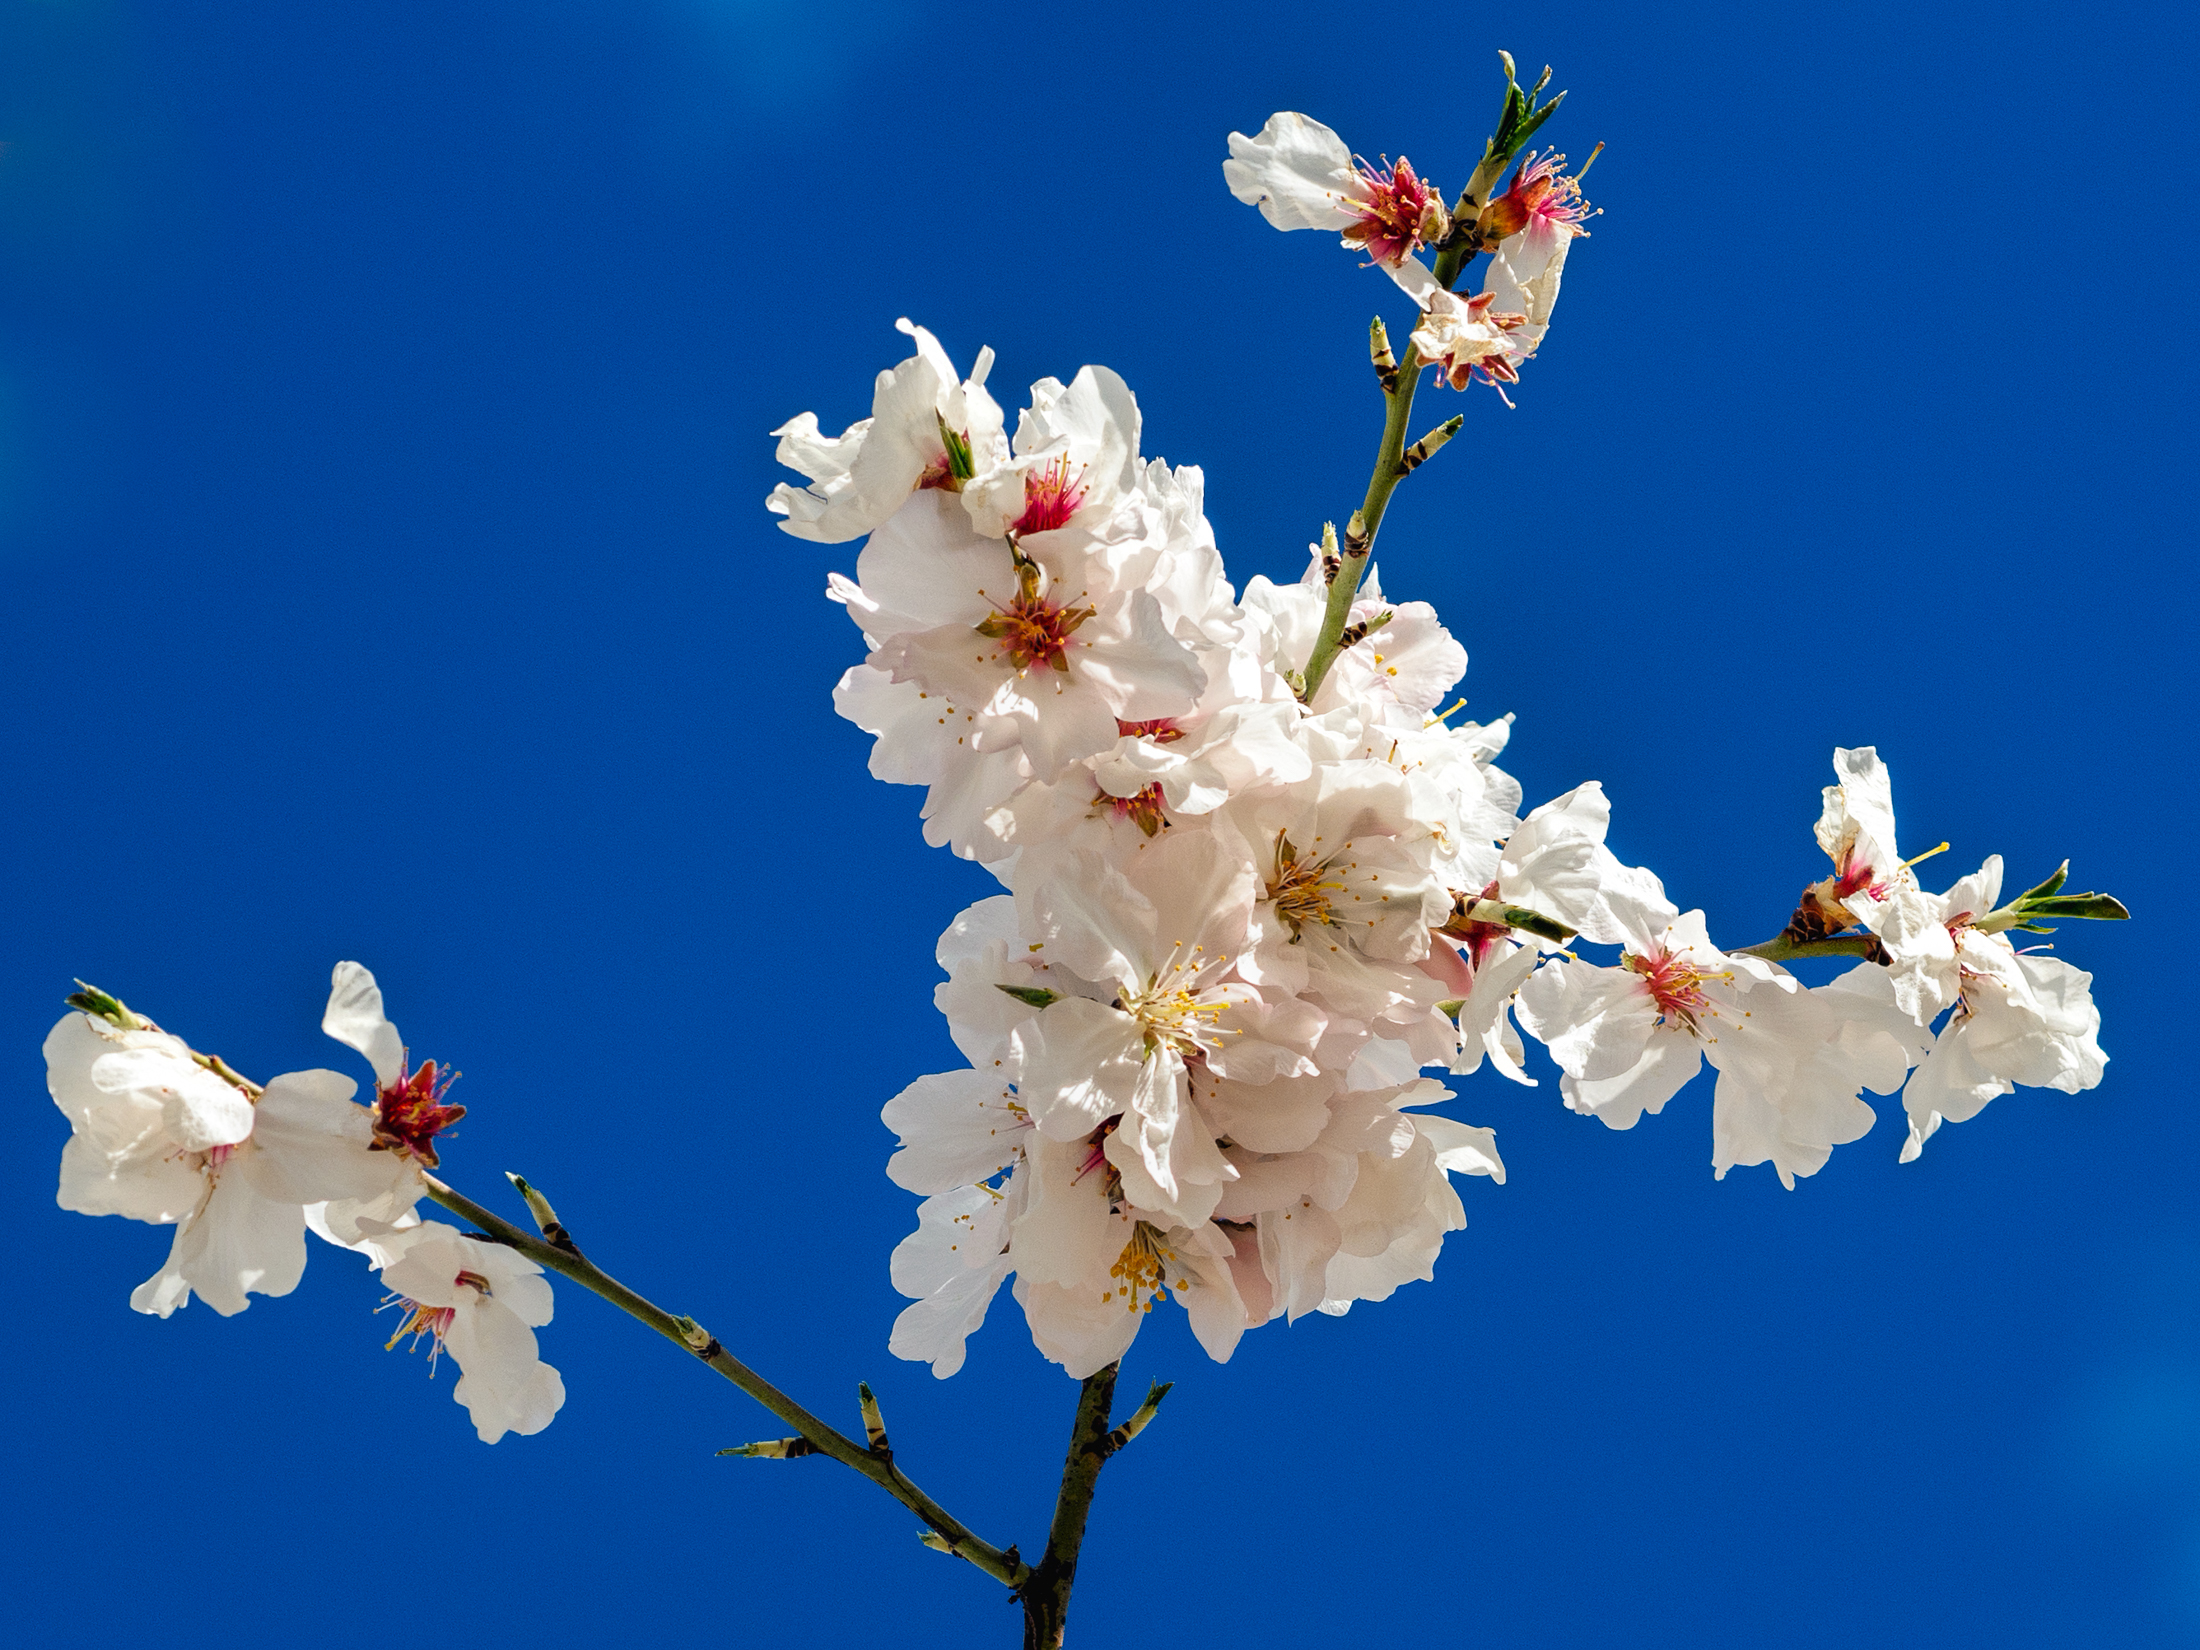 Almonds bloom in February, El Maetrat